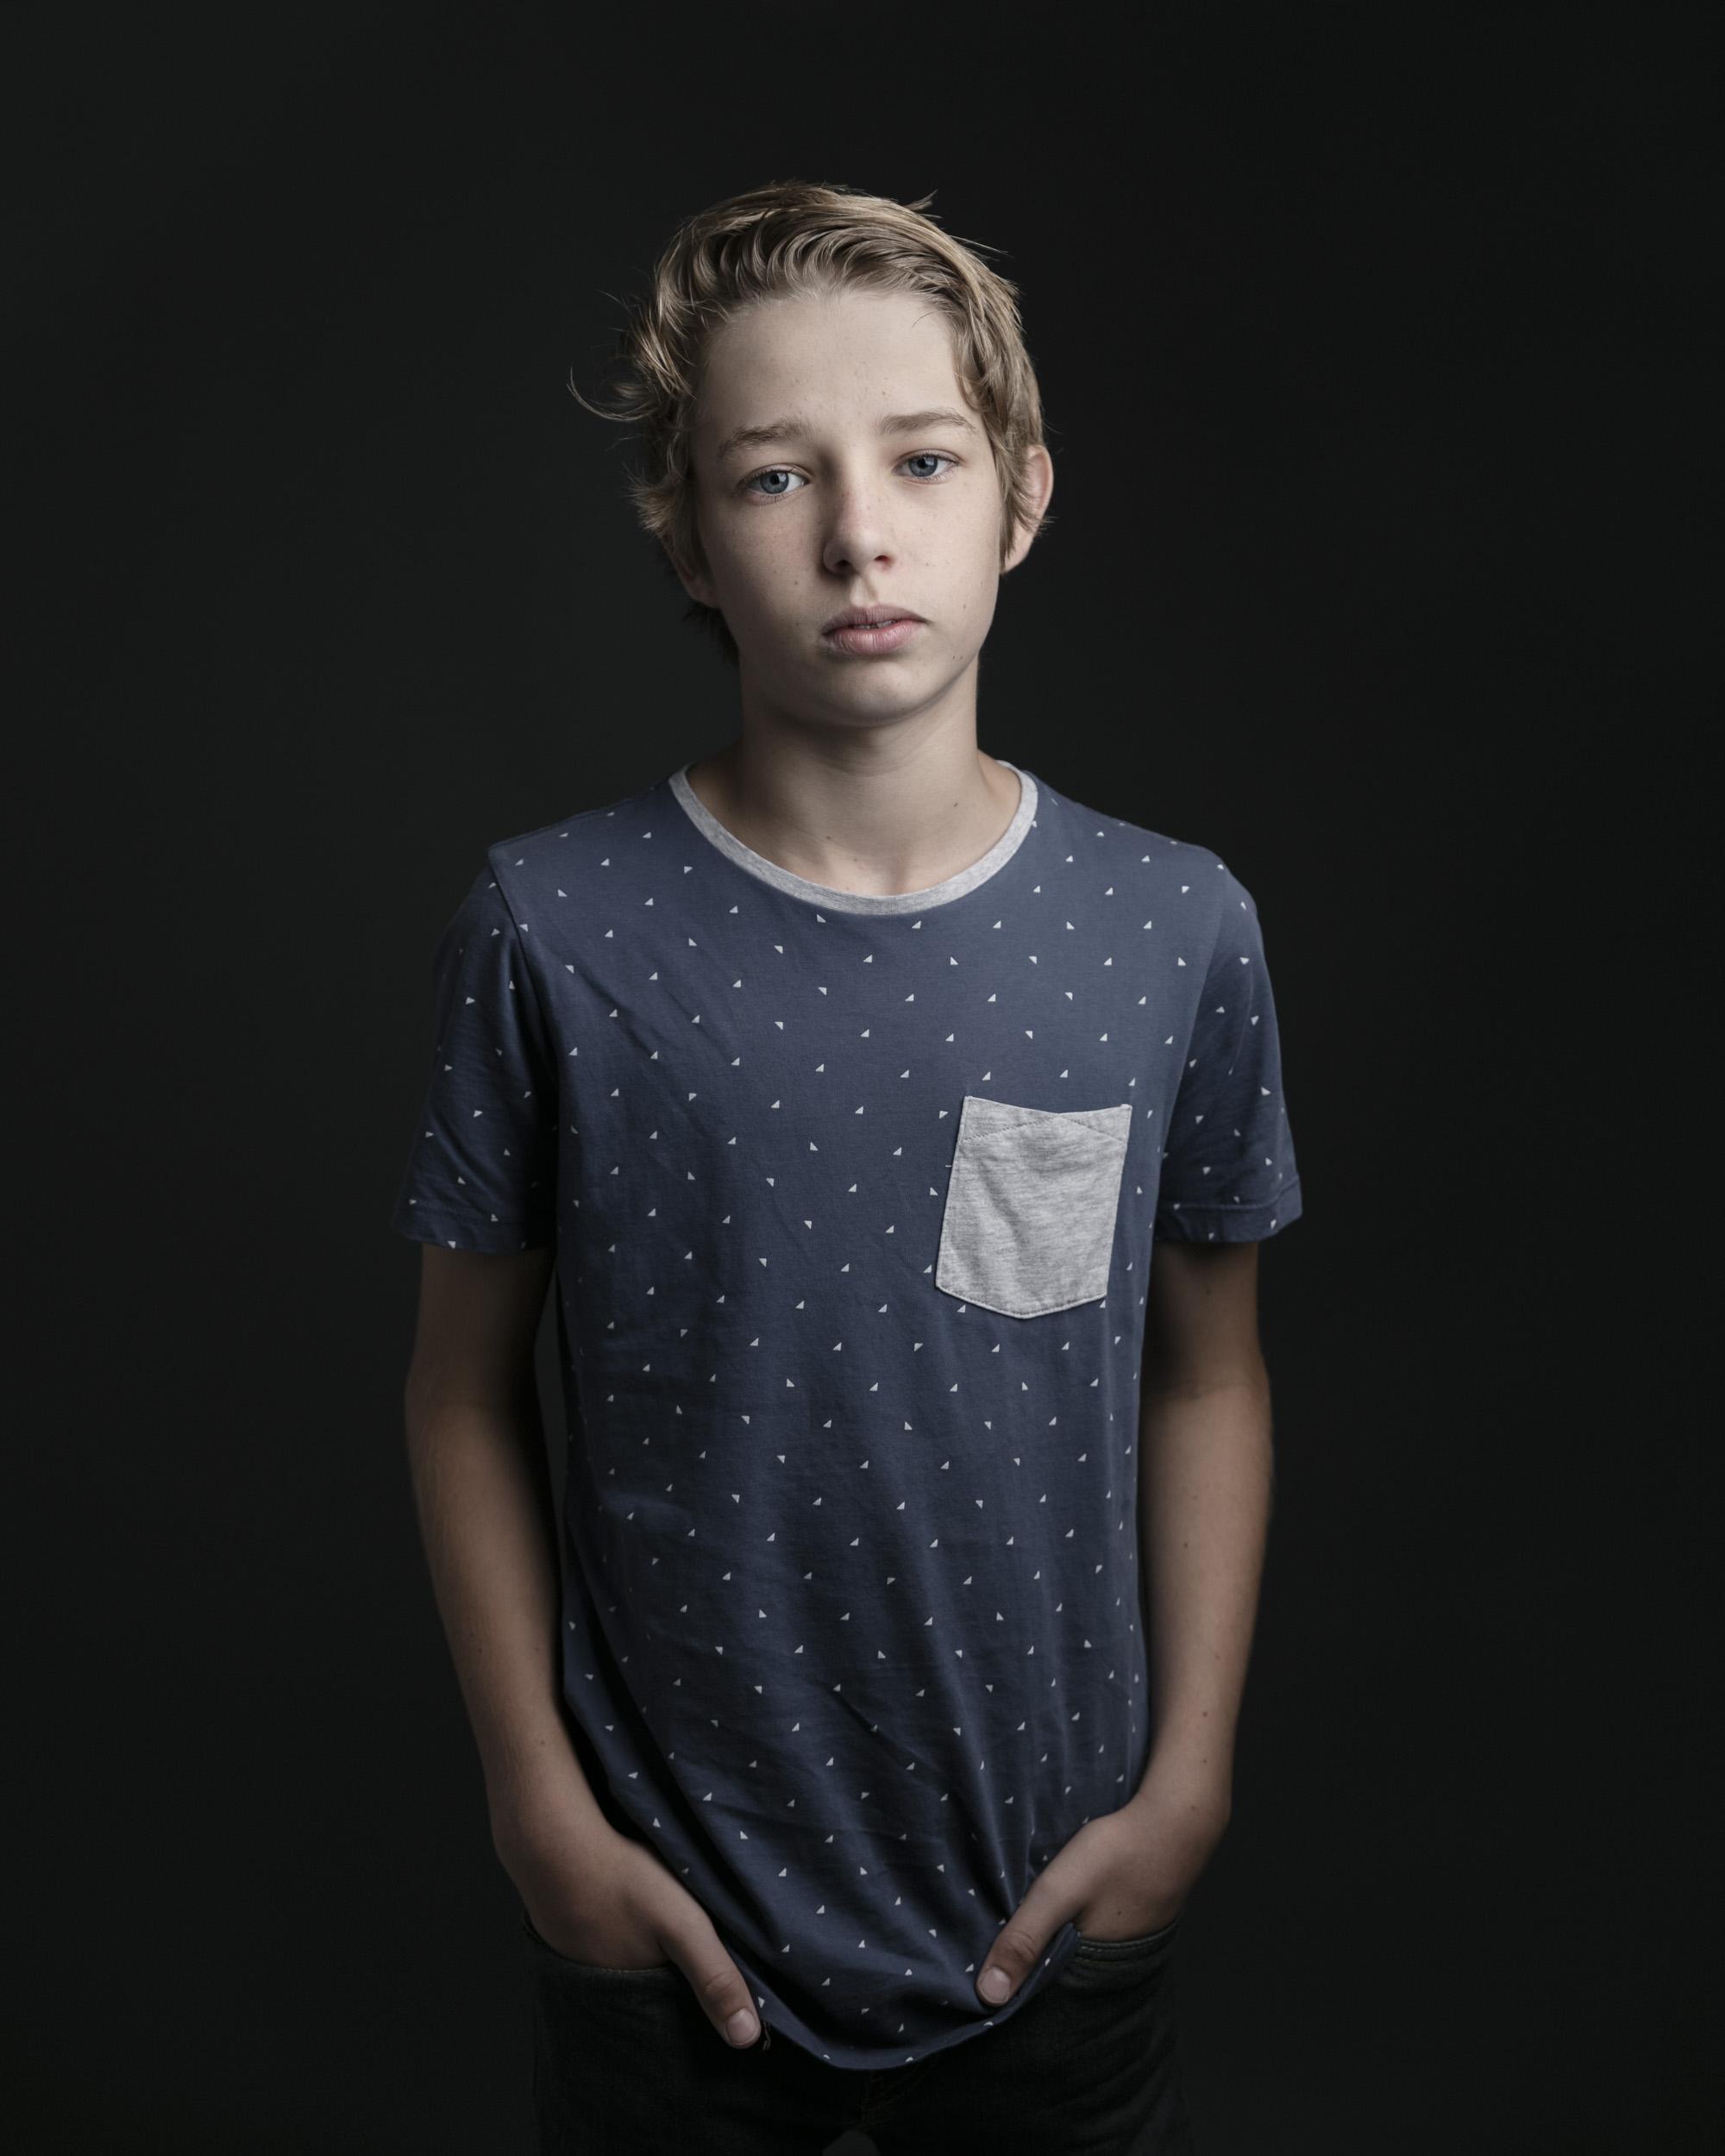 marina-mcdonald-child-portrait-photography-portfolio-canberra-teen-boy-casual